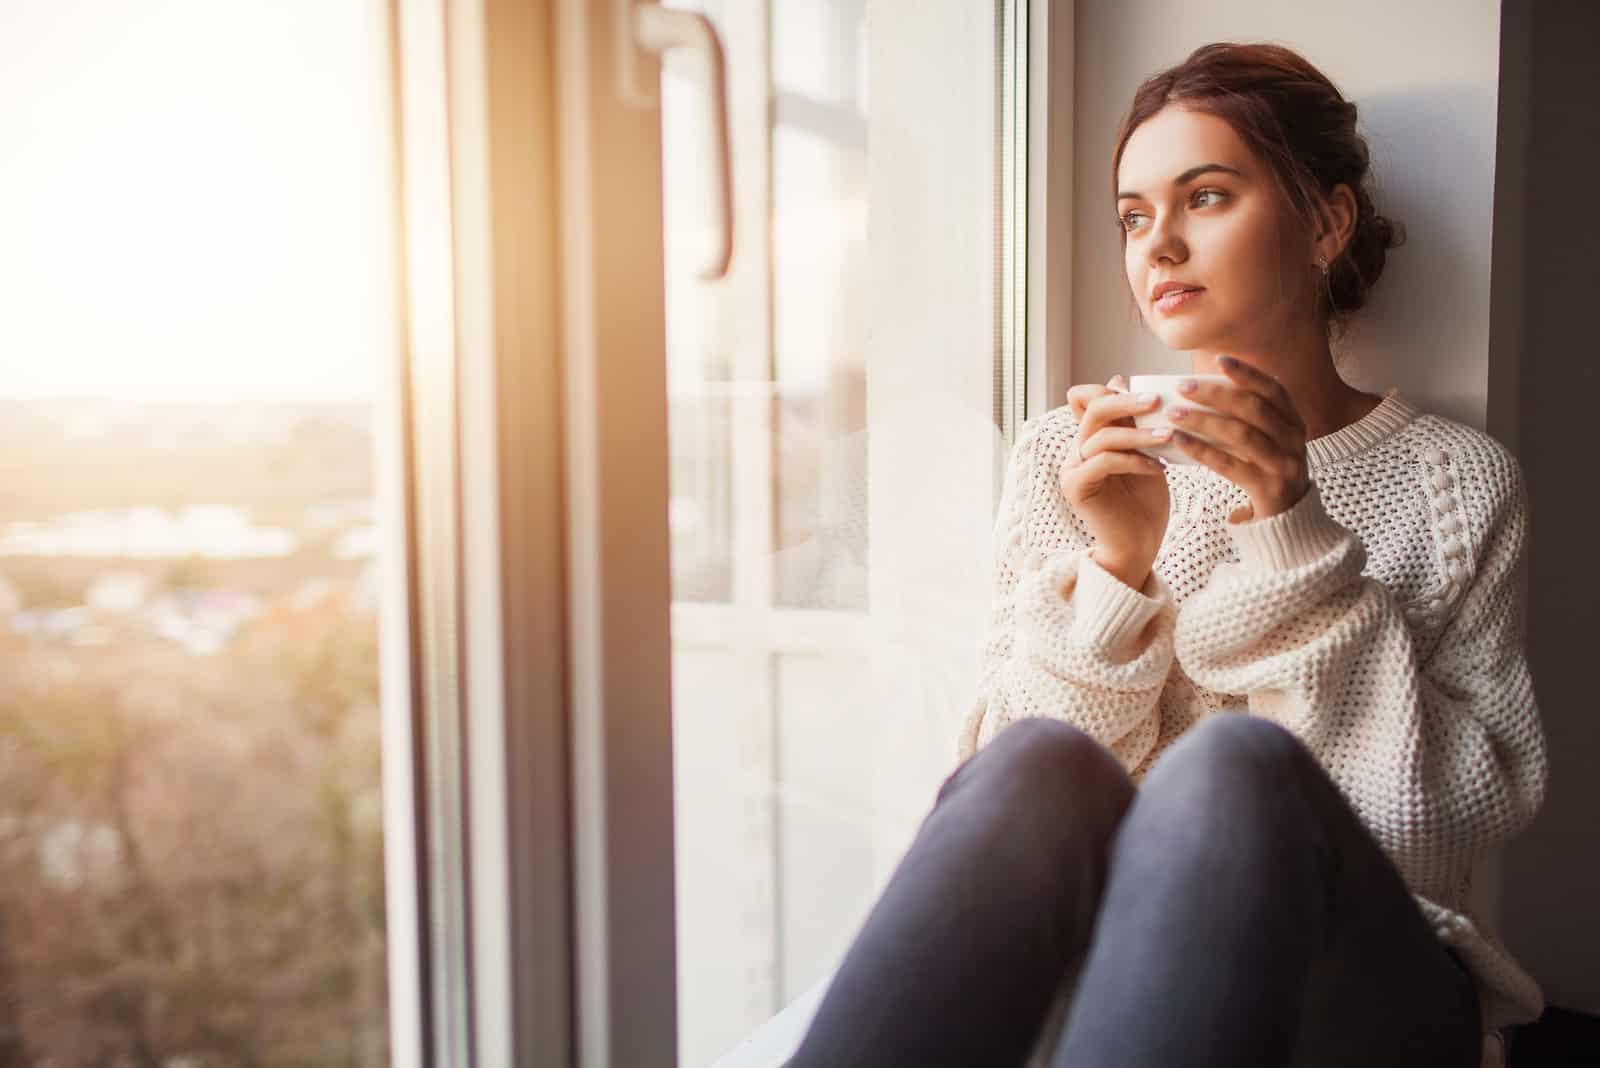 Schöne junge Frau, die Kaffee trinkt